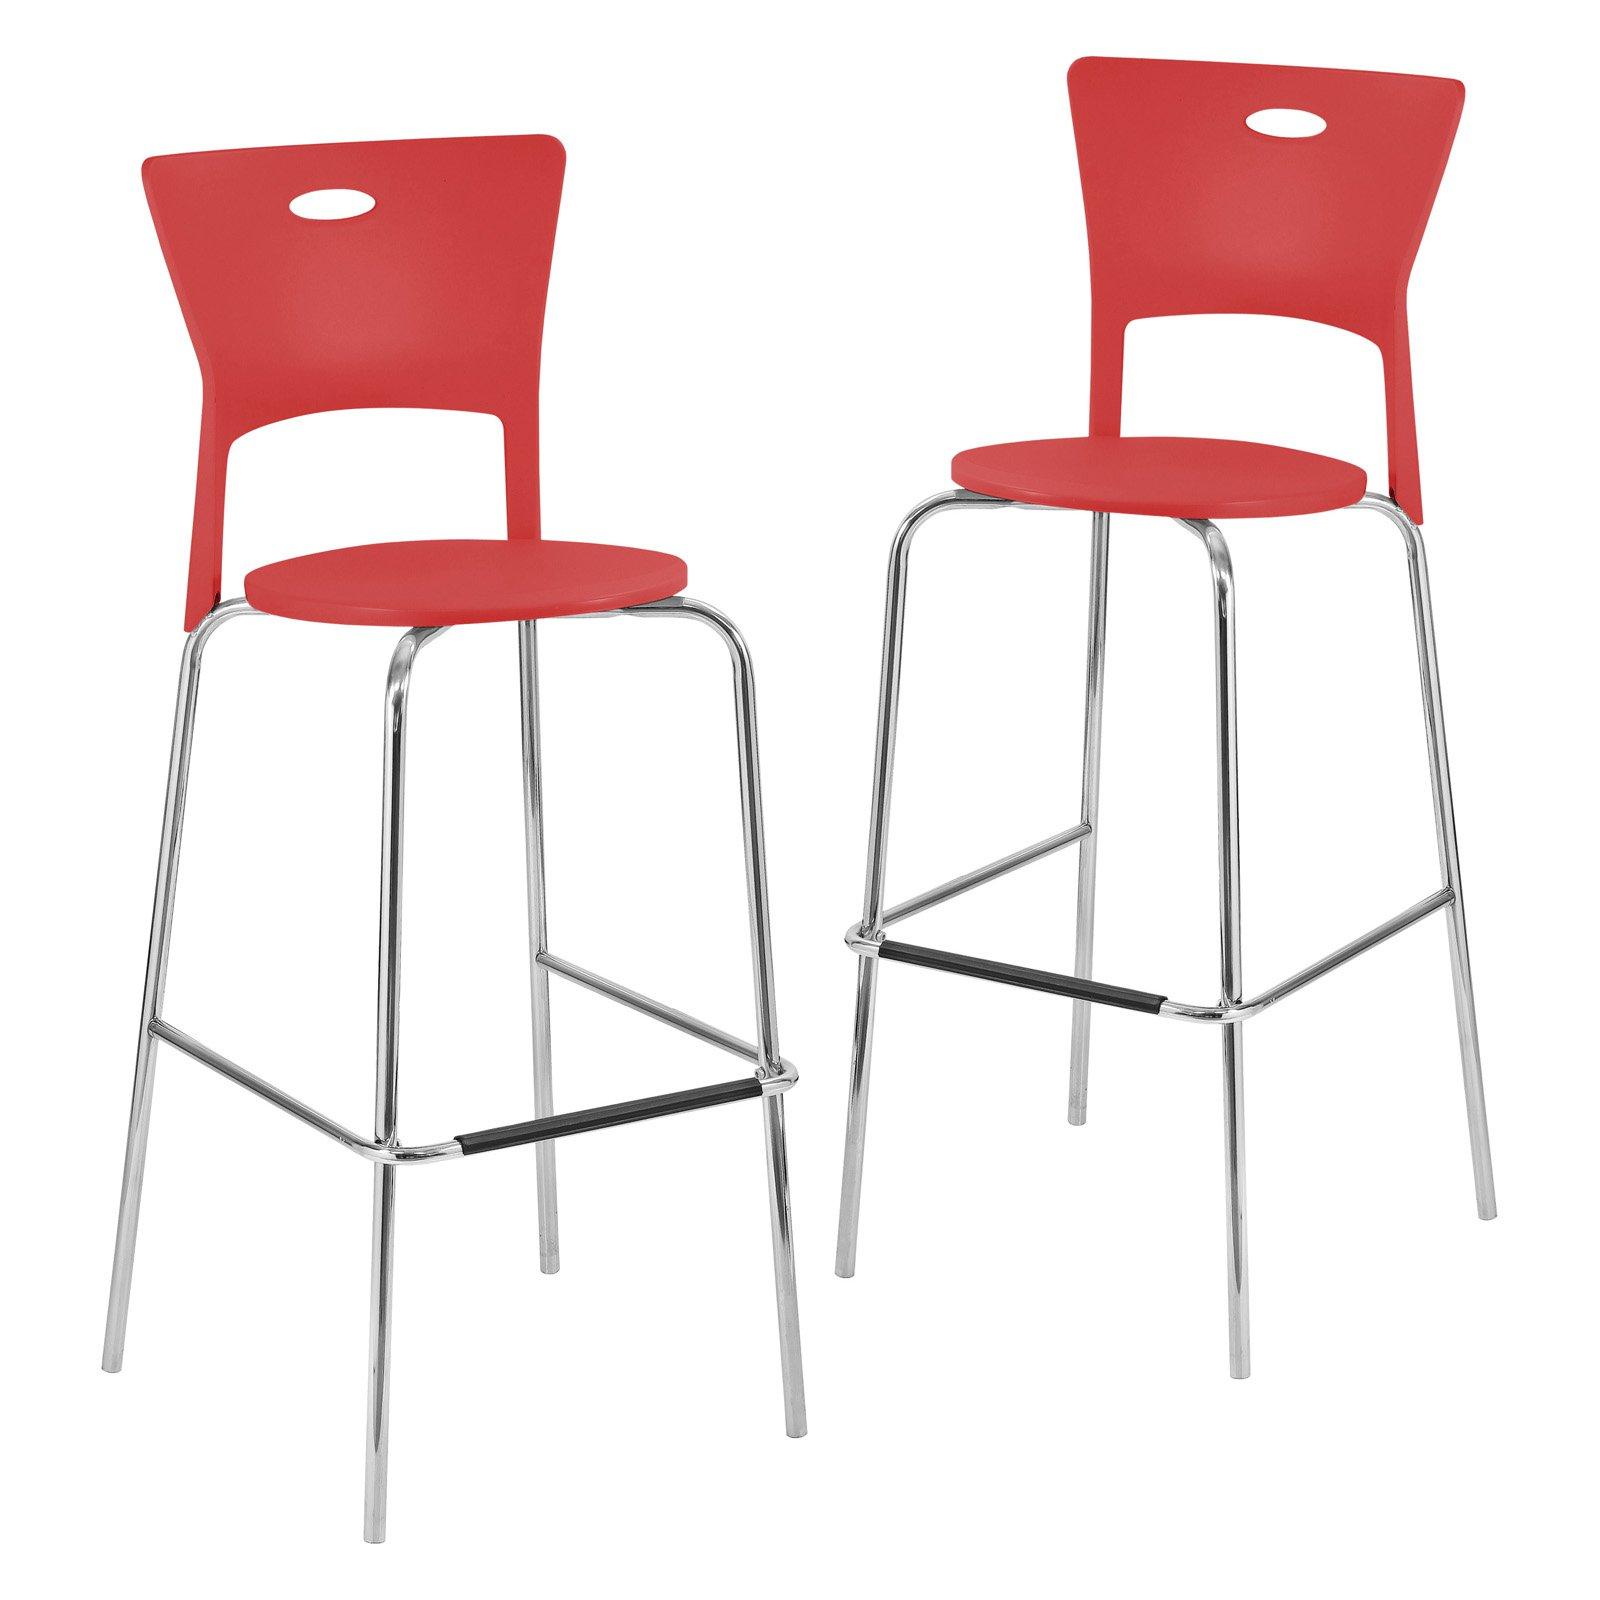 Lumisource Mimi Bar Stools - Red - Set of 2